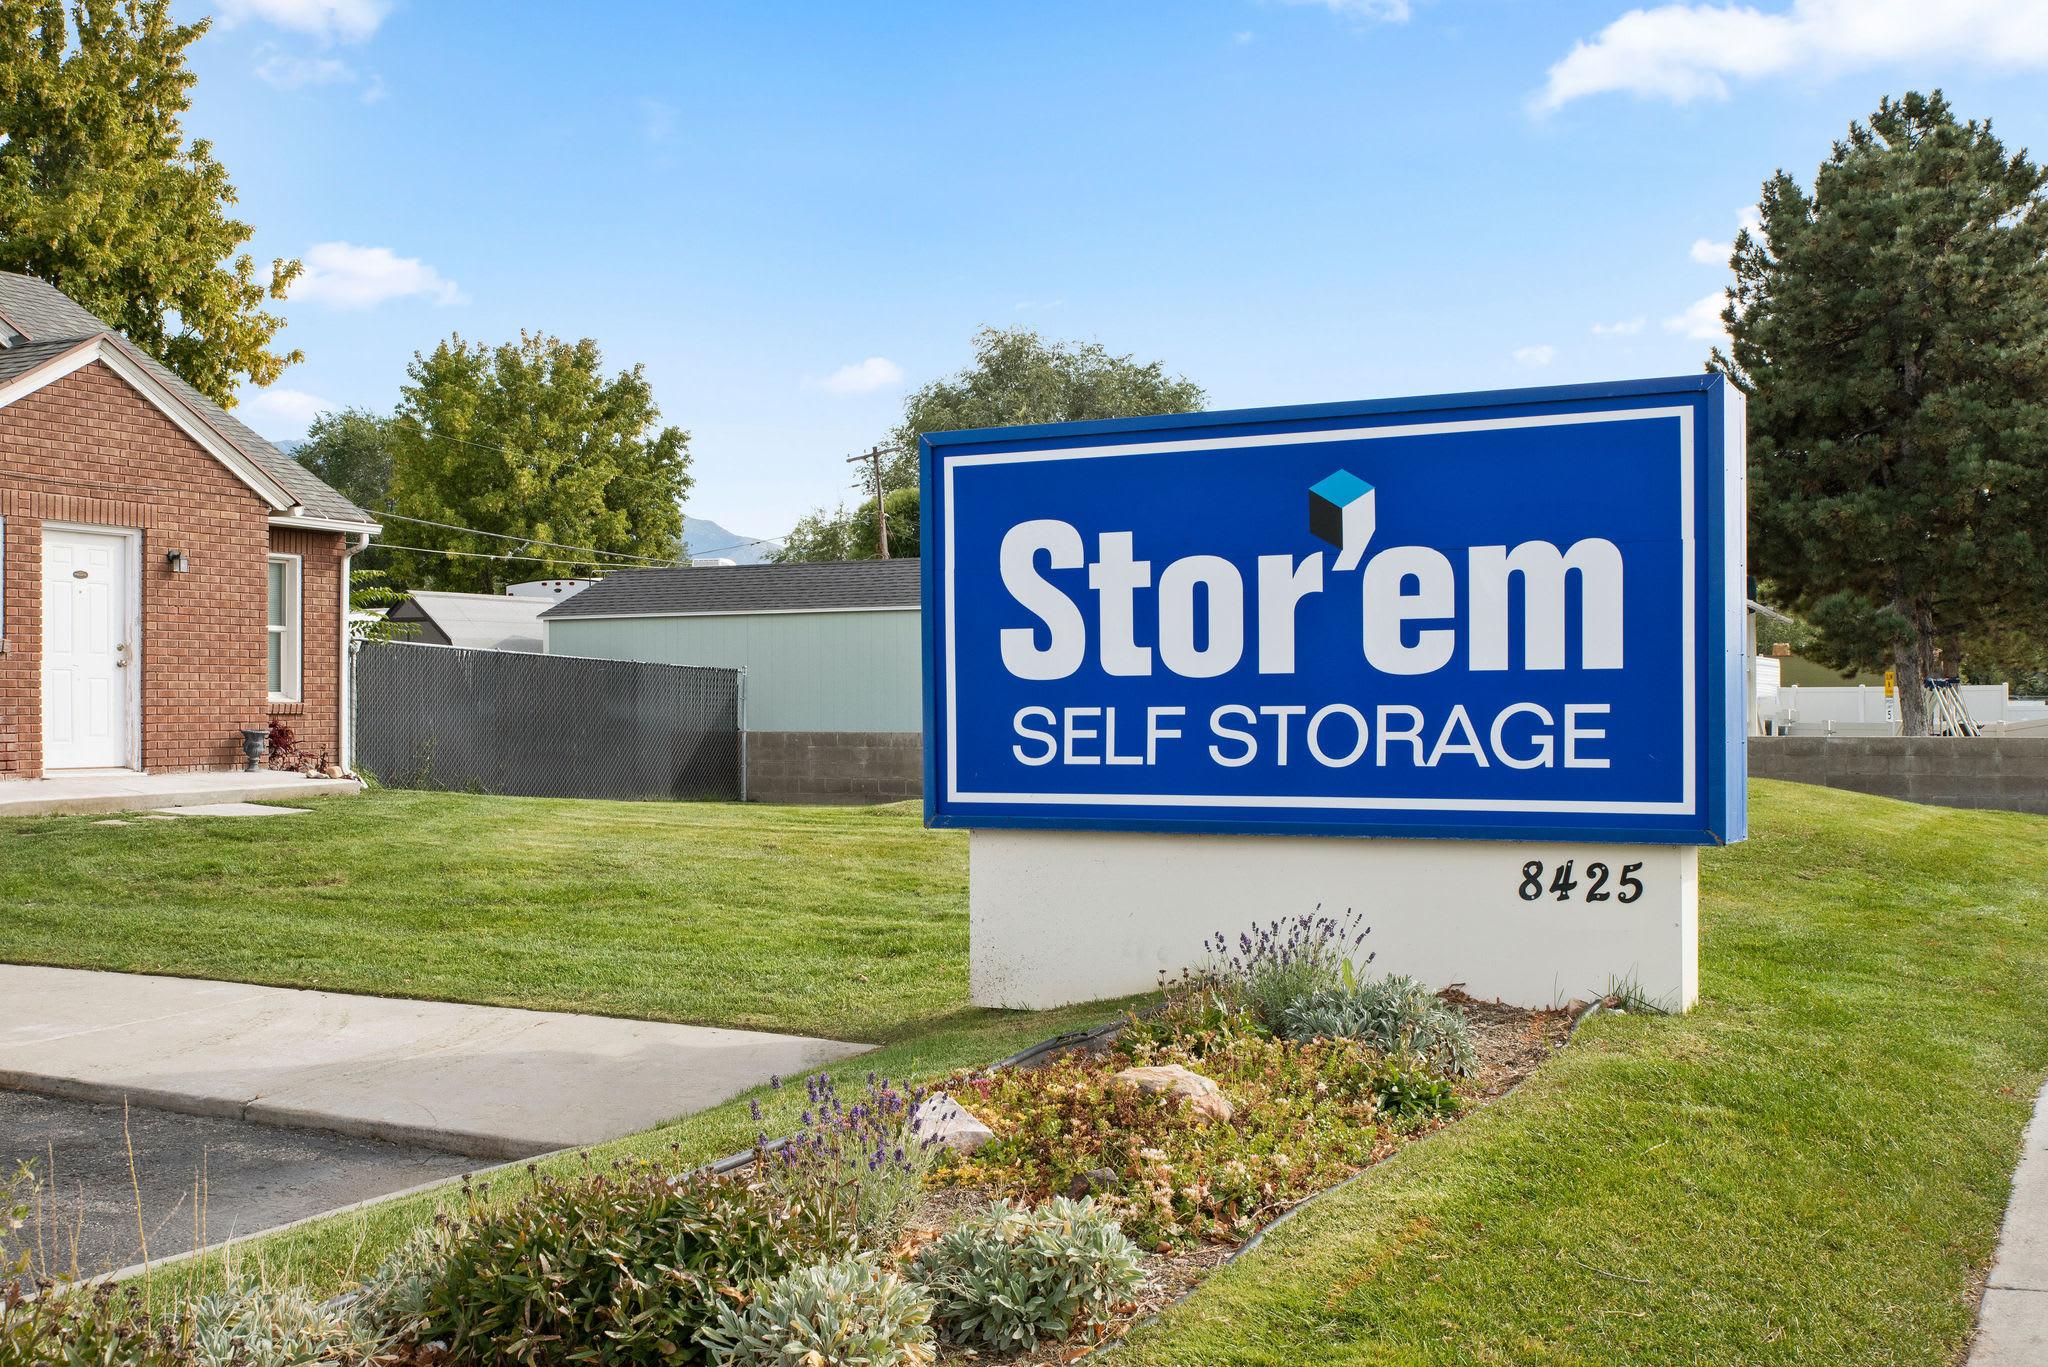 Street Signage of Stor'em Self Storage in Sandy, Utah